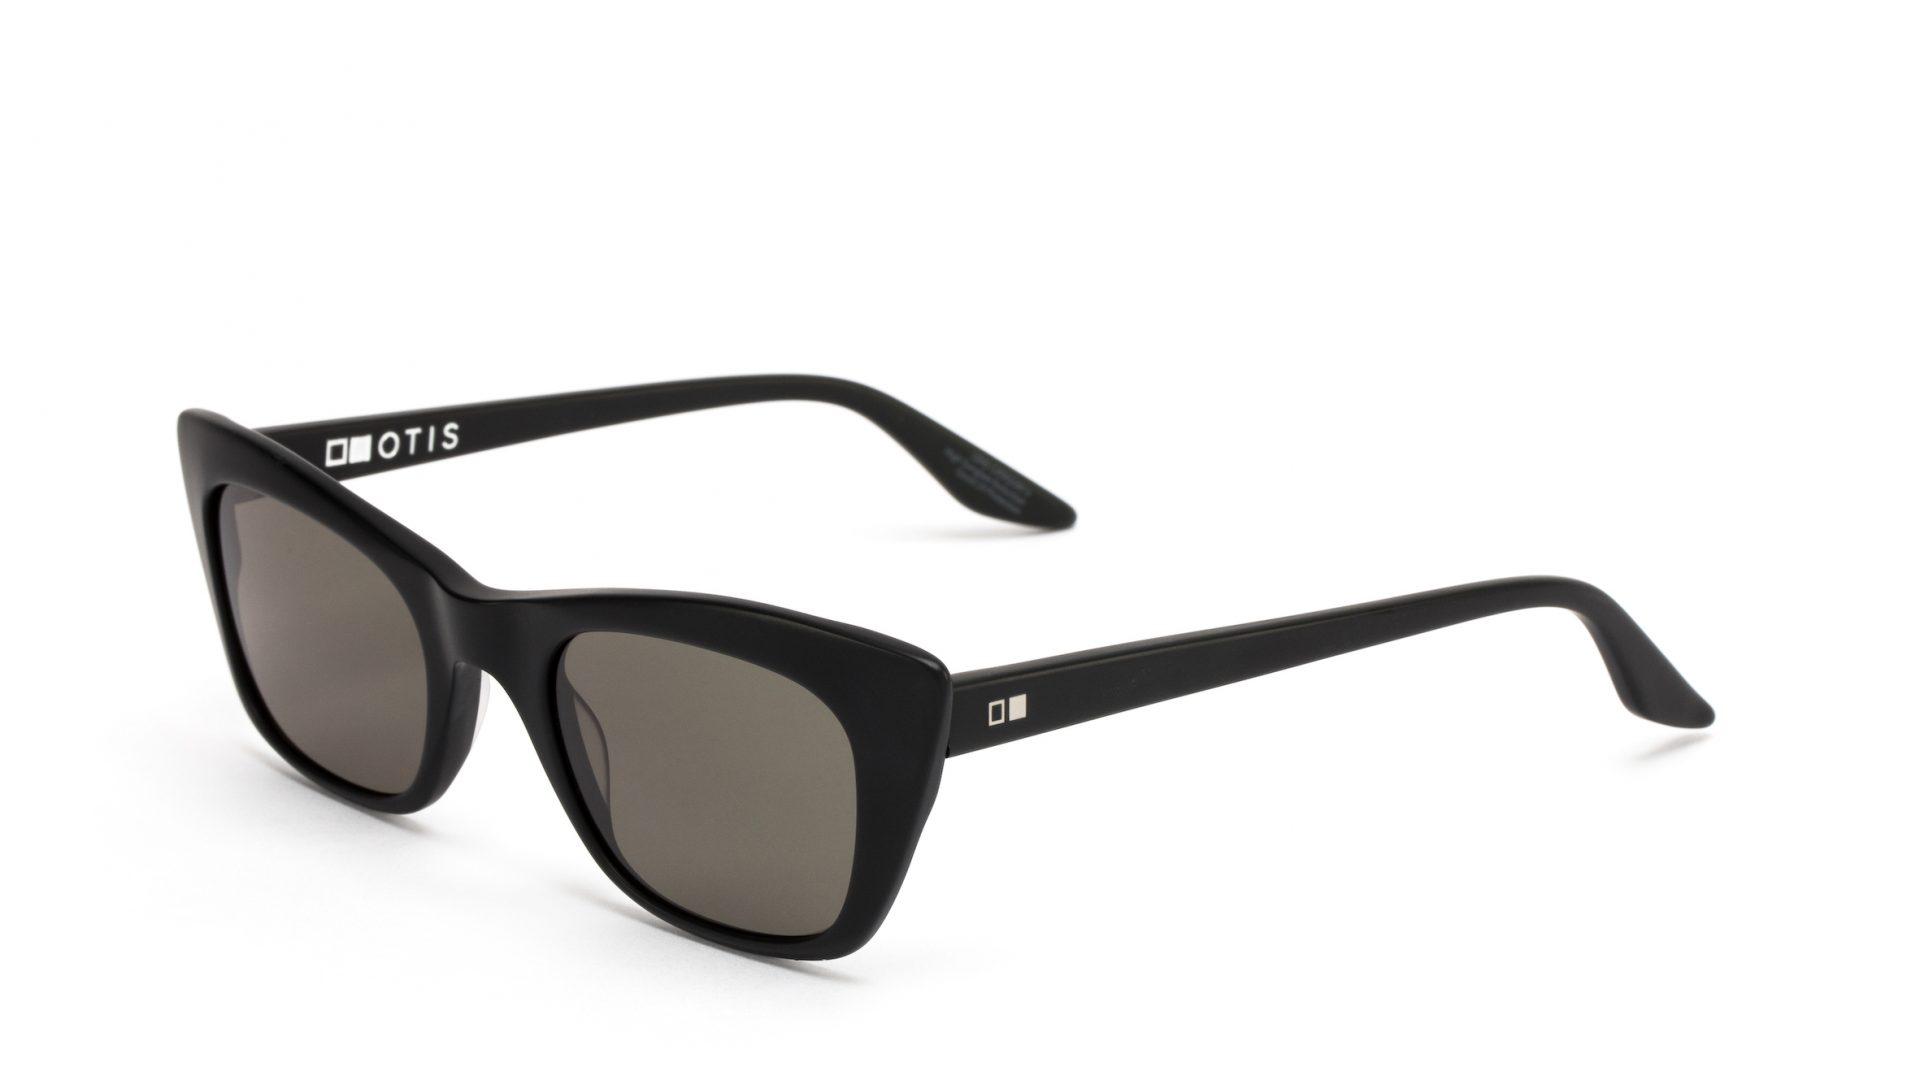 Otis SS20 Sunglasses